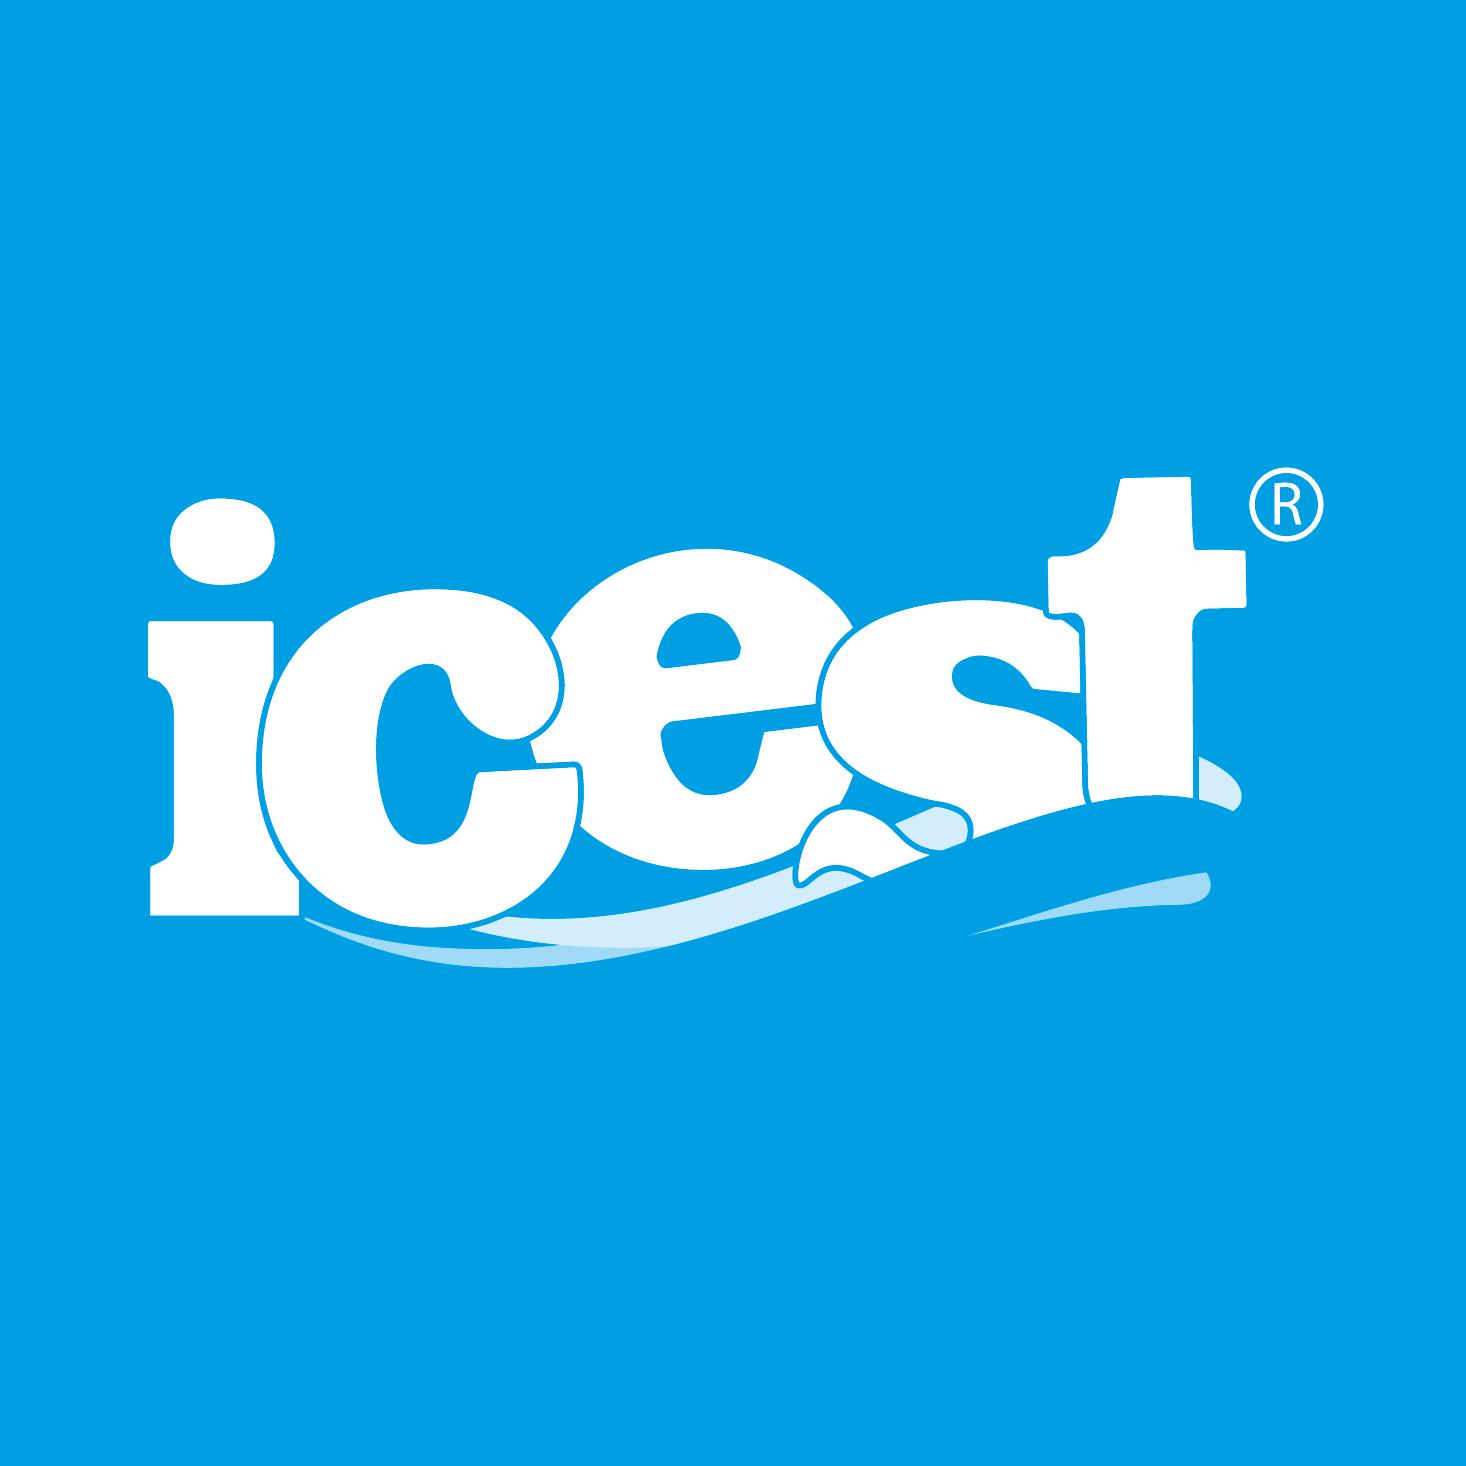 Icest Logo photo - 1